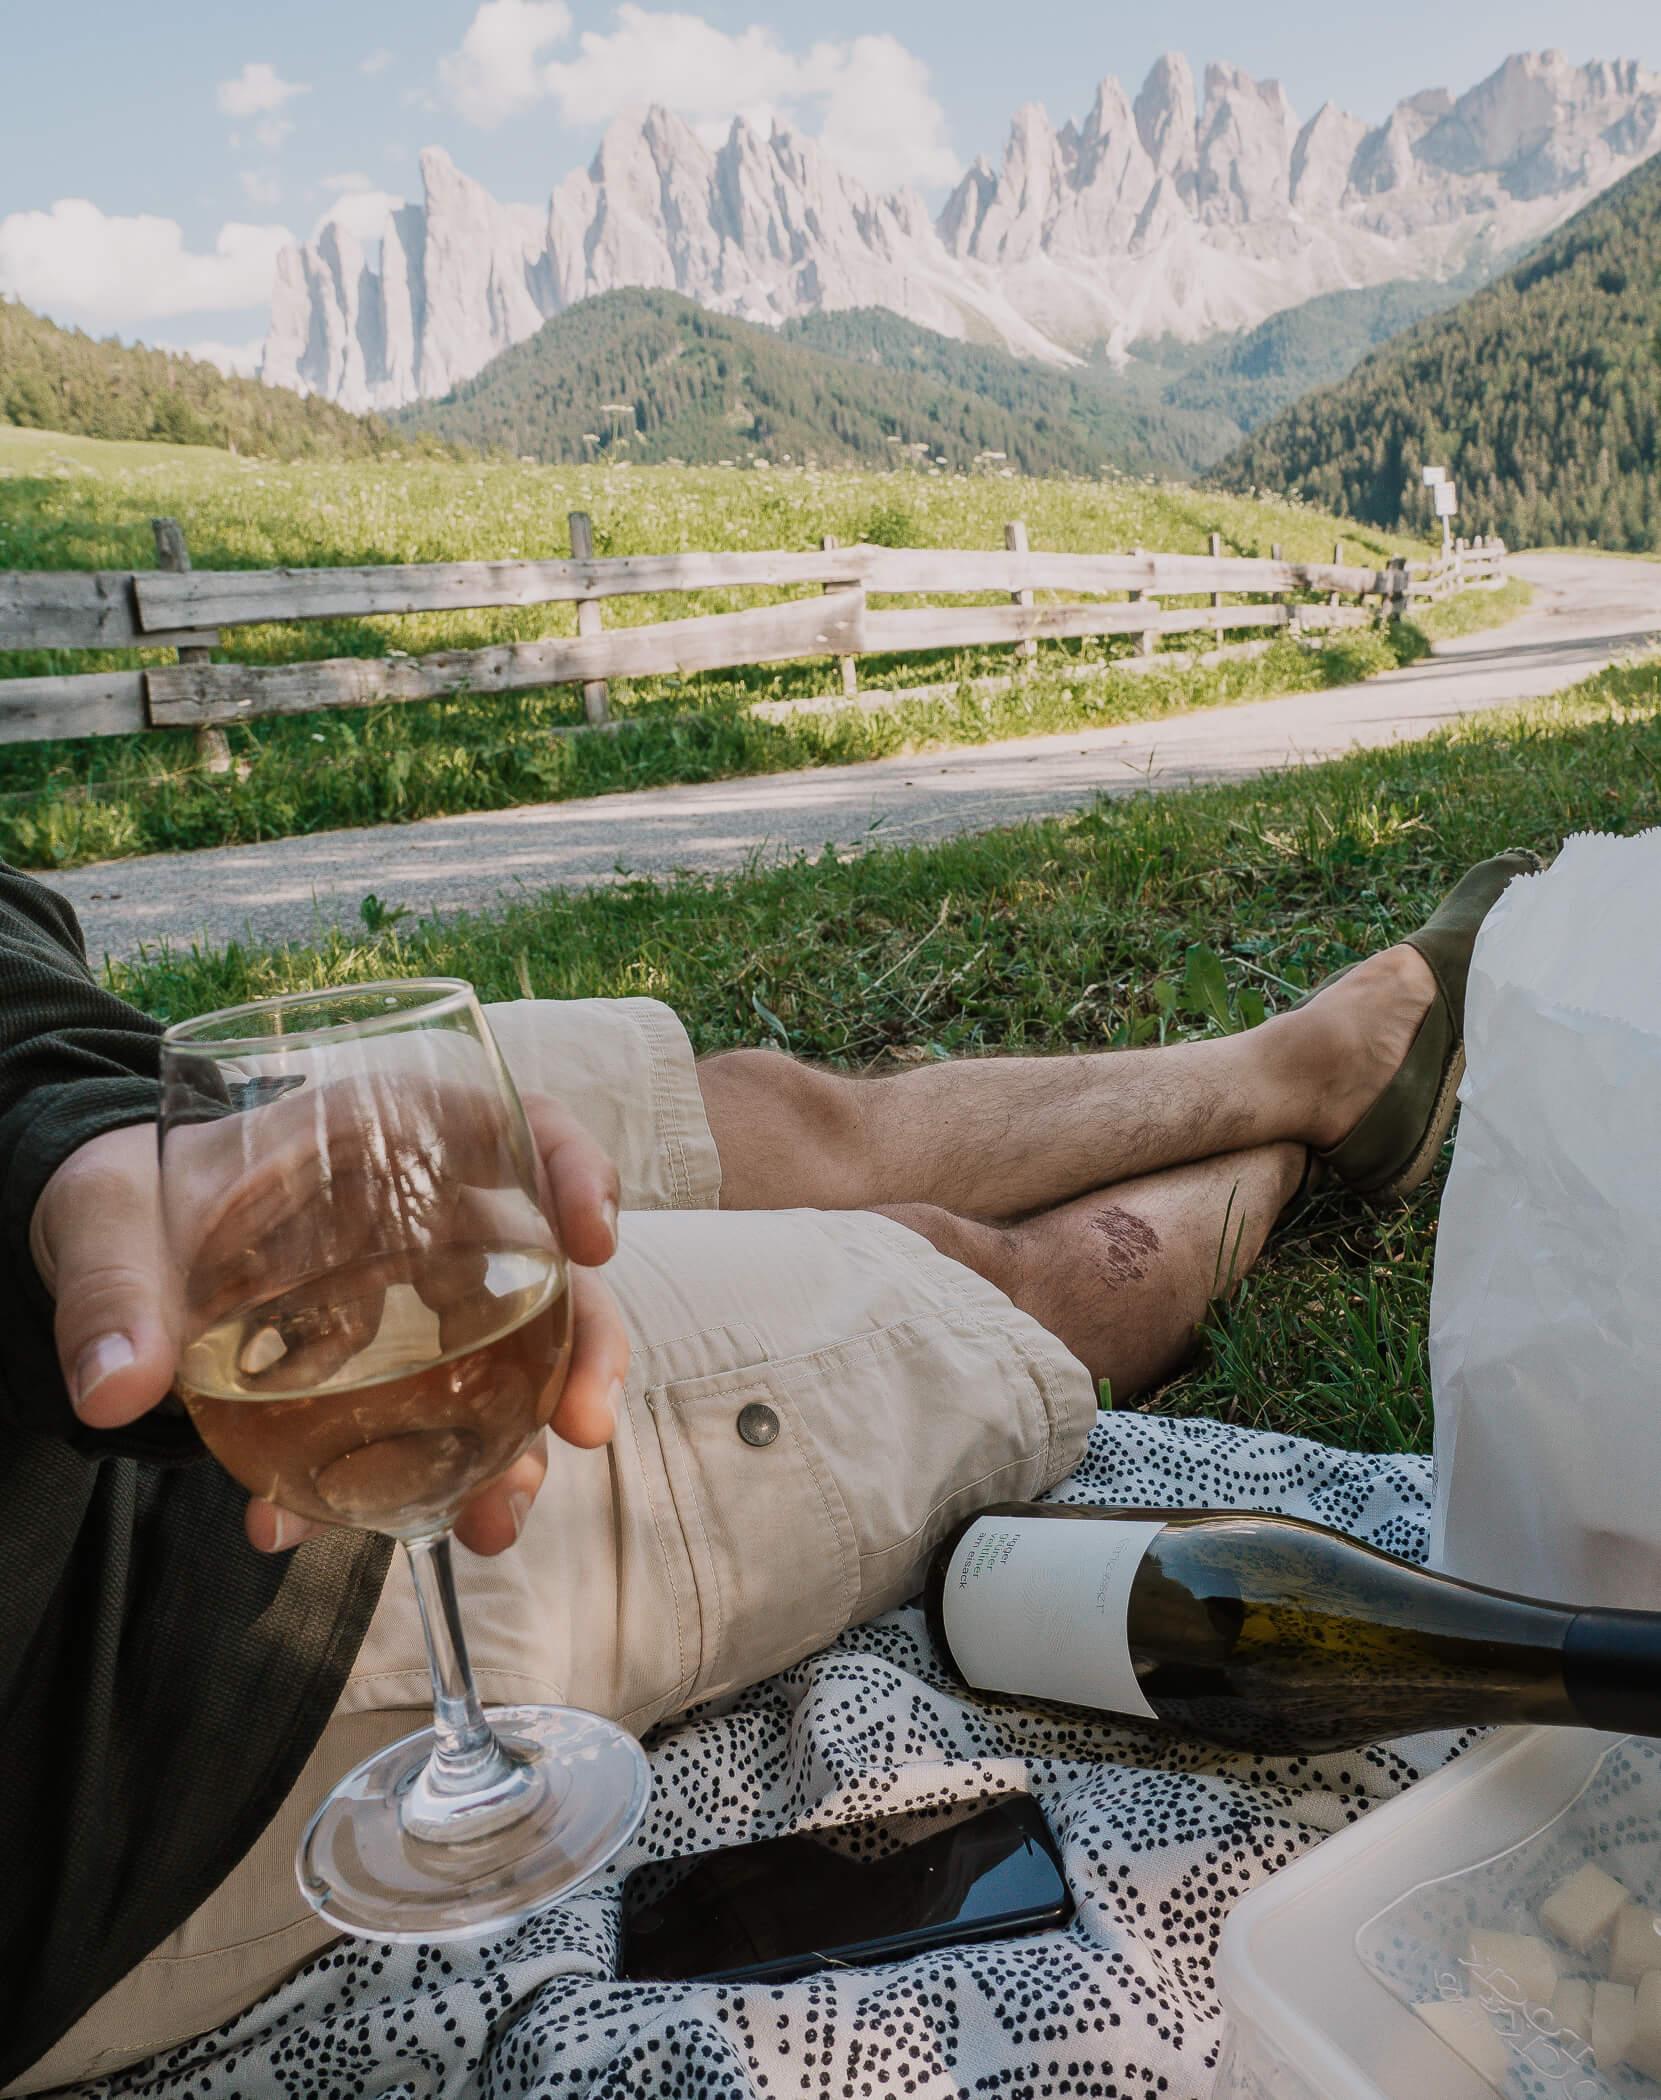 Picknick in Südtirol